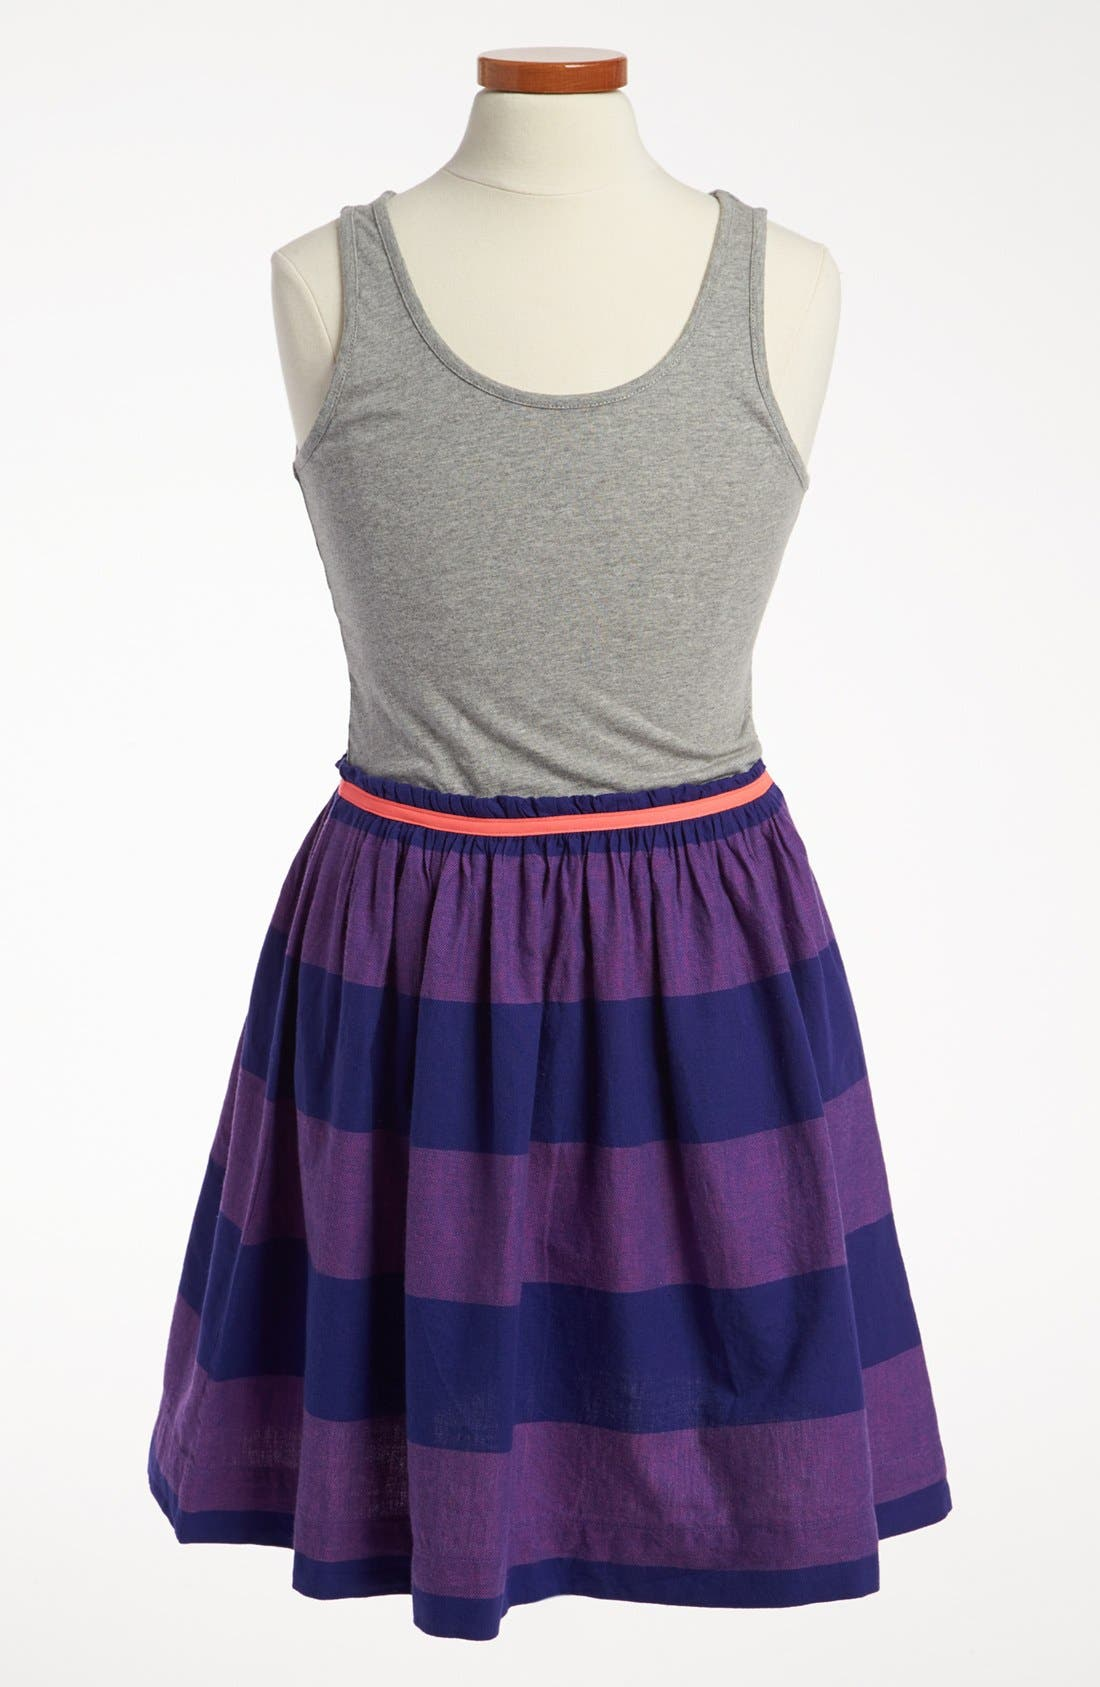 Main Image - Johnnie b 'Vest' Dress (Big Girls)